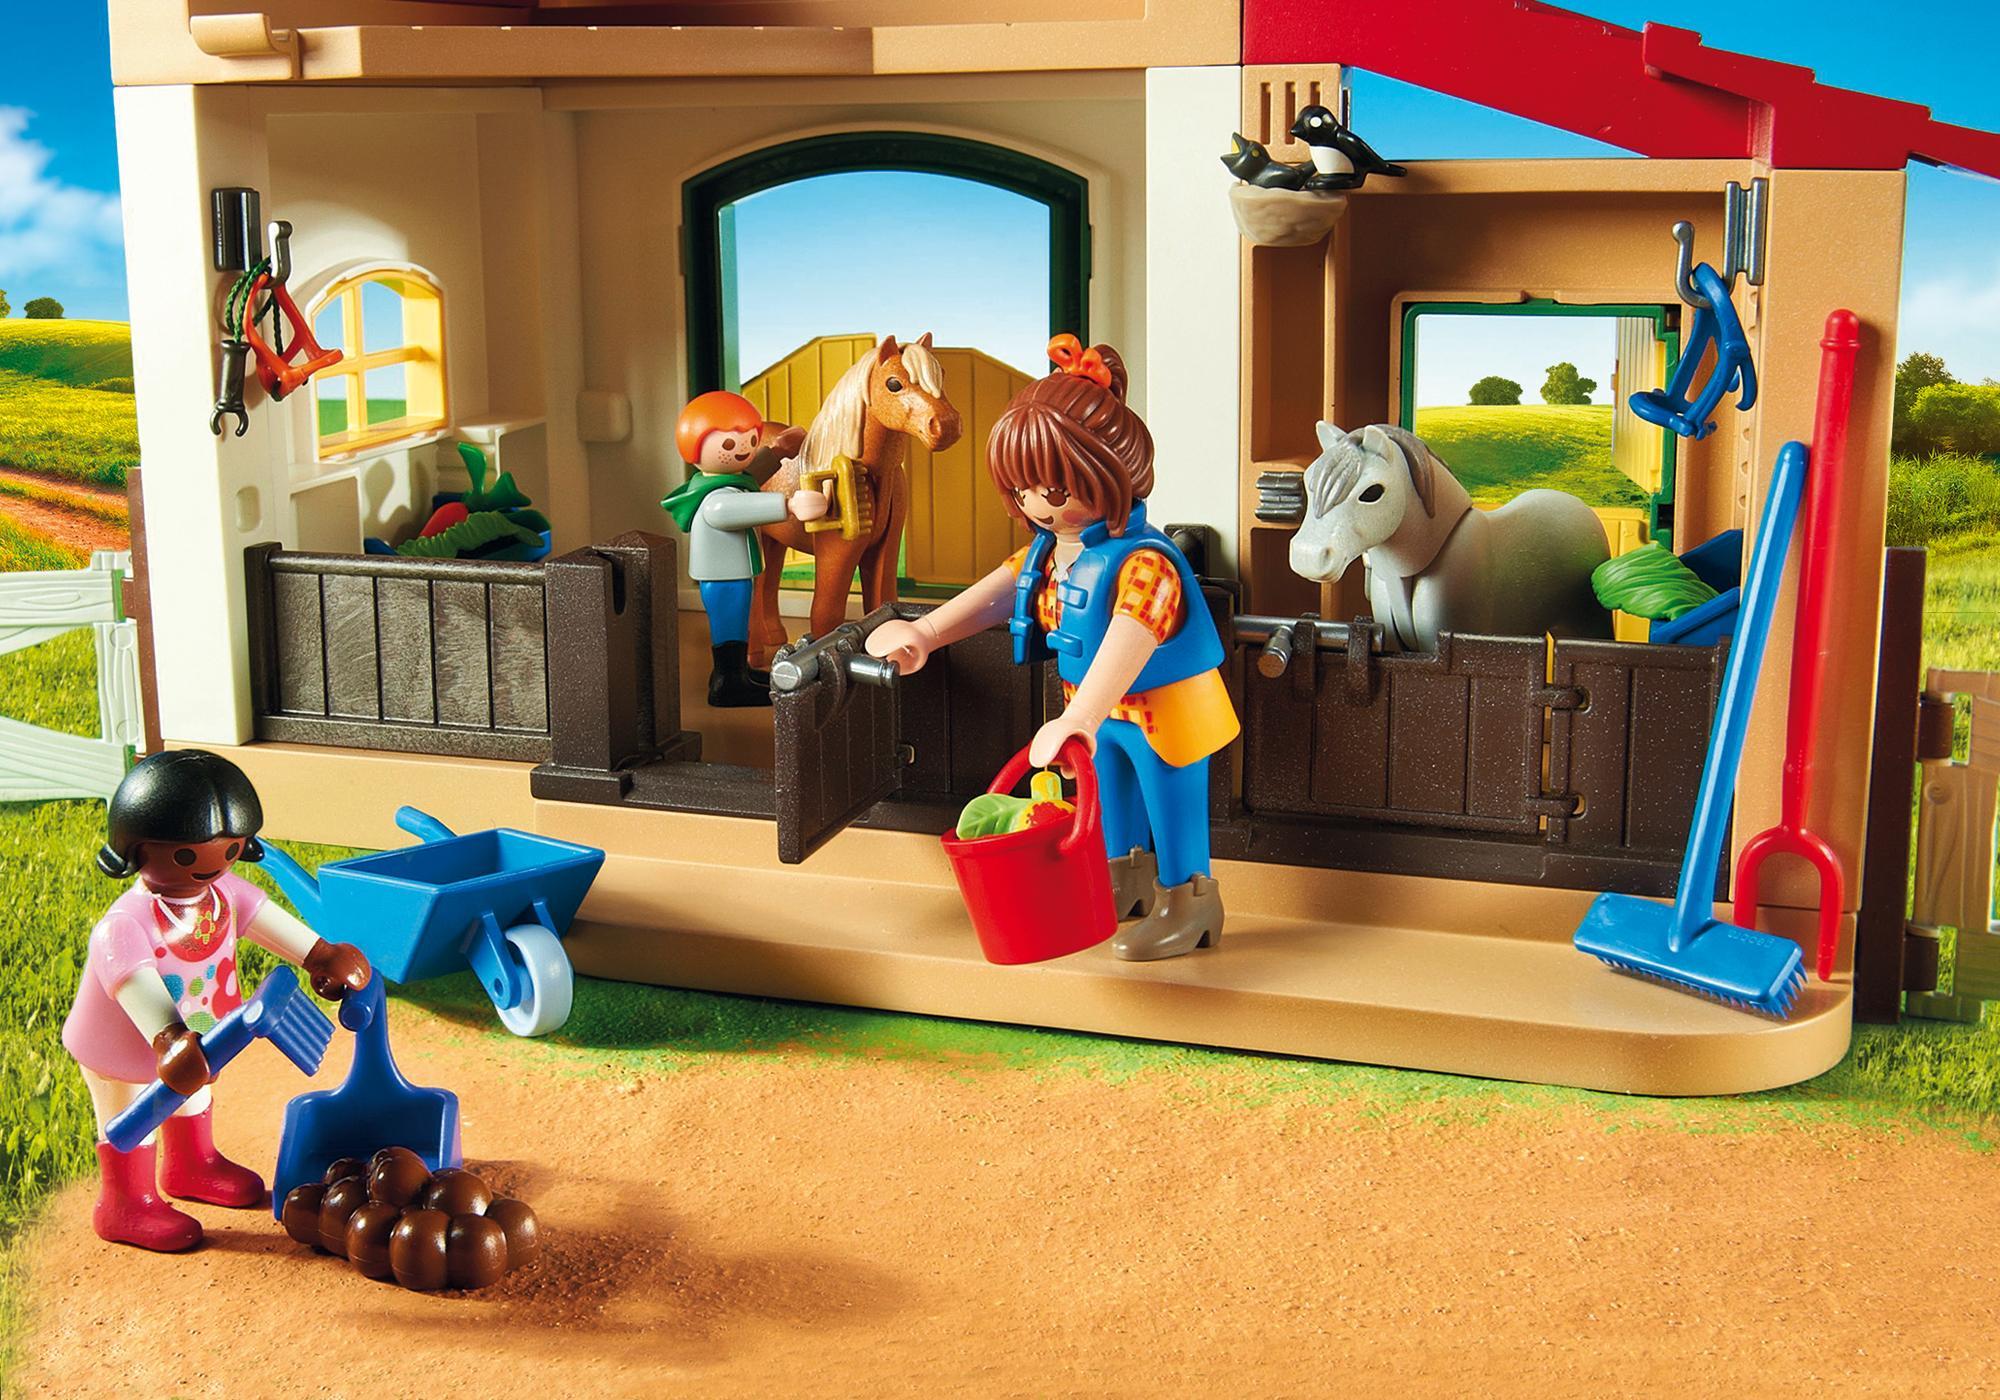 http://media.playmobil.com/i/playmobil/6927_product_extra3/Pony Farm